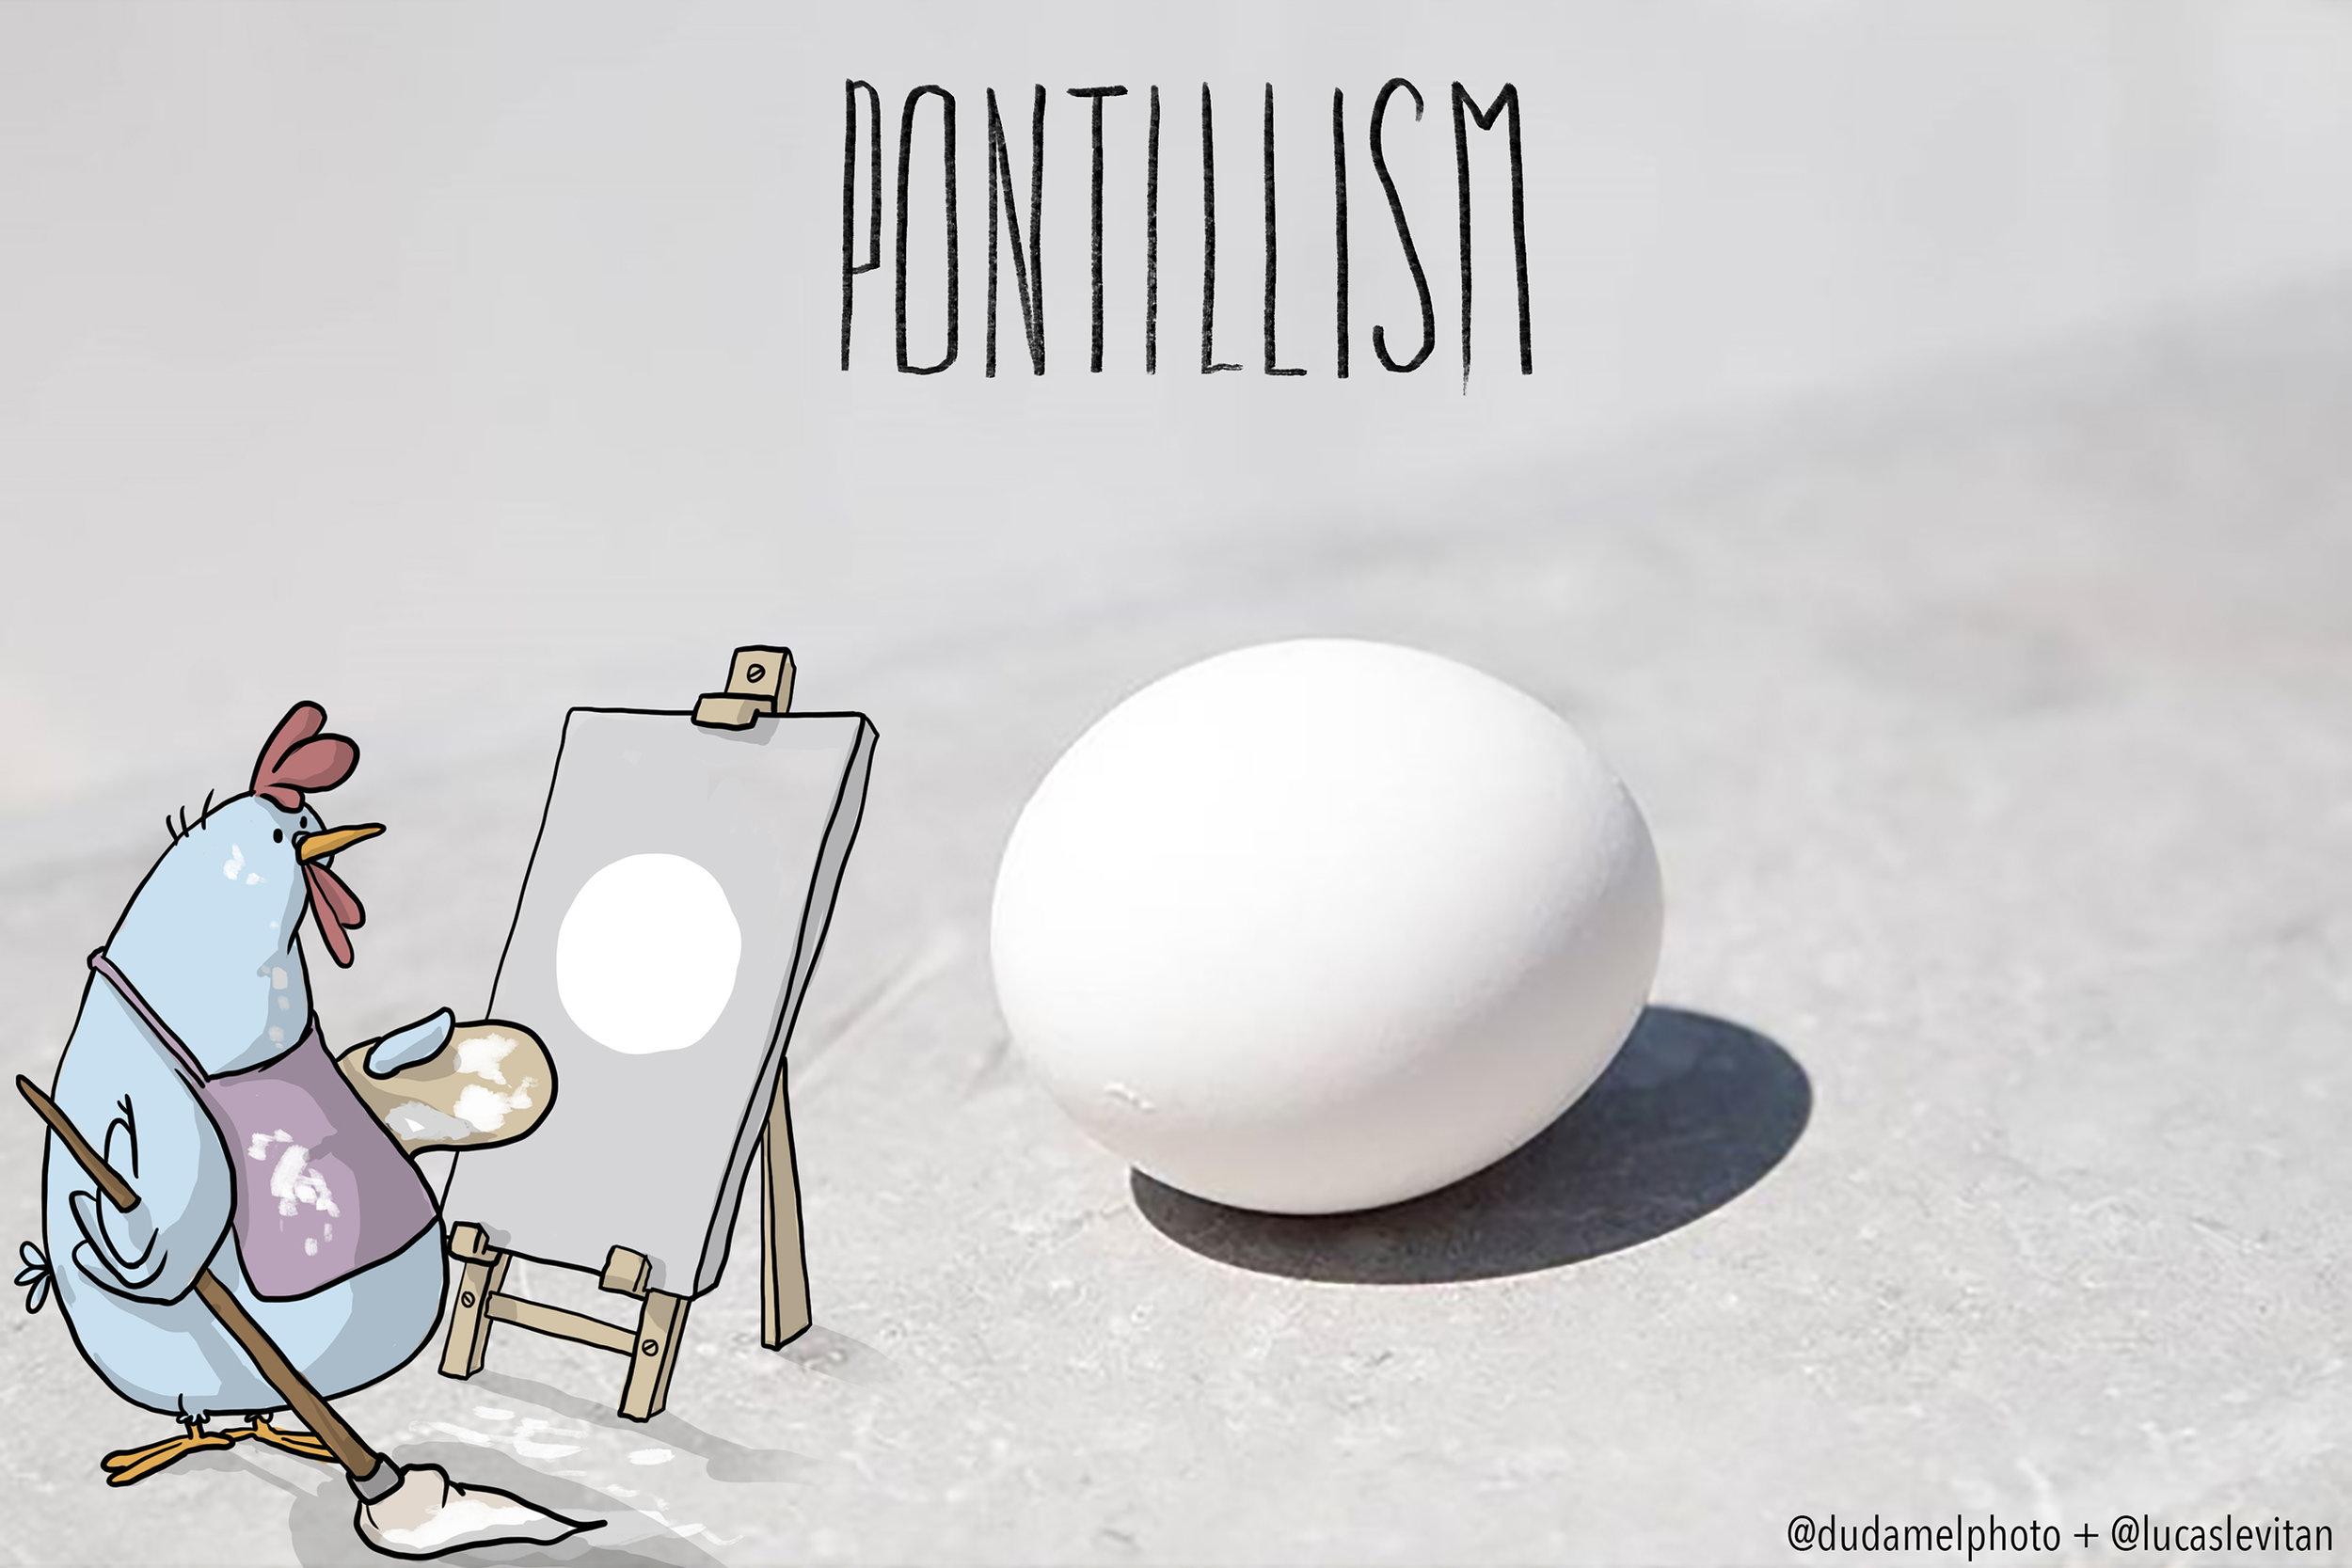 02 dudamelphoto EGG 06 painter pontillism.jpg